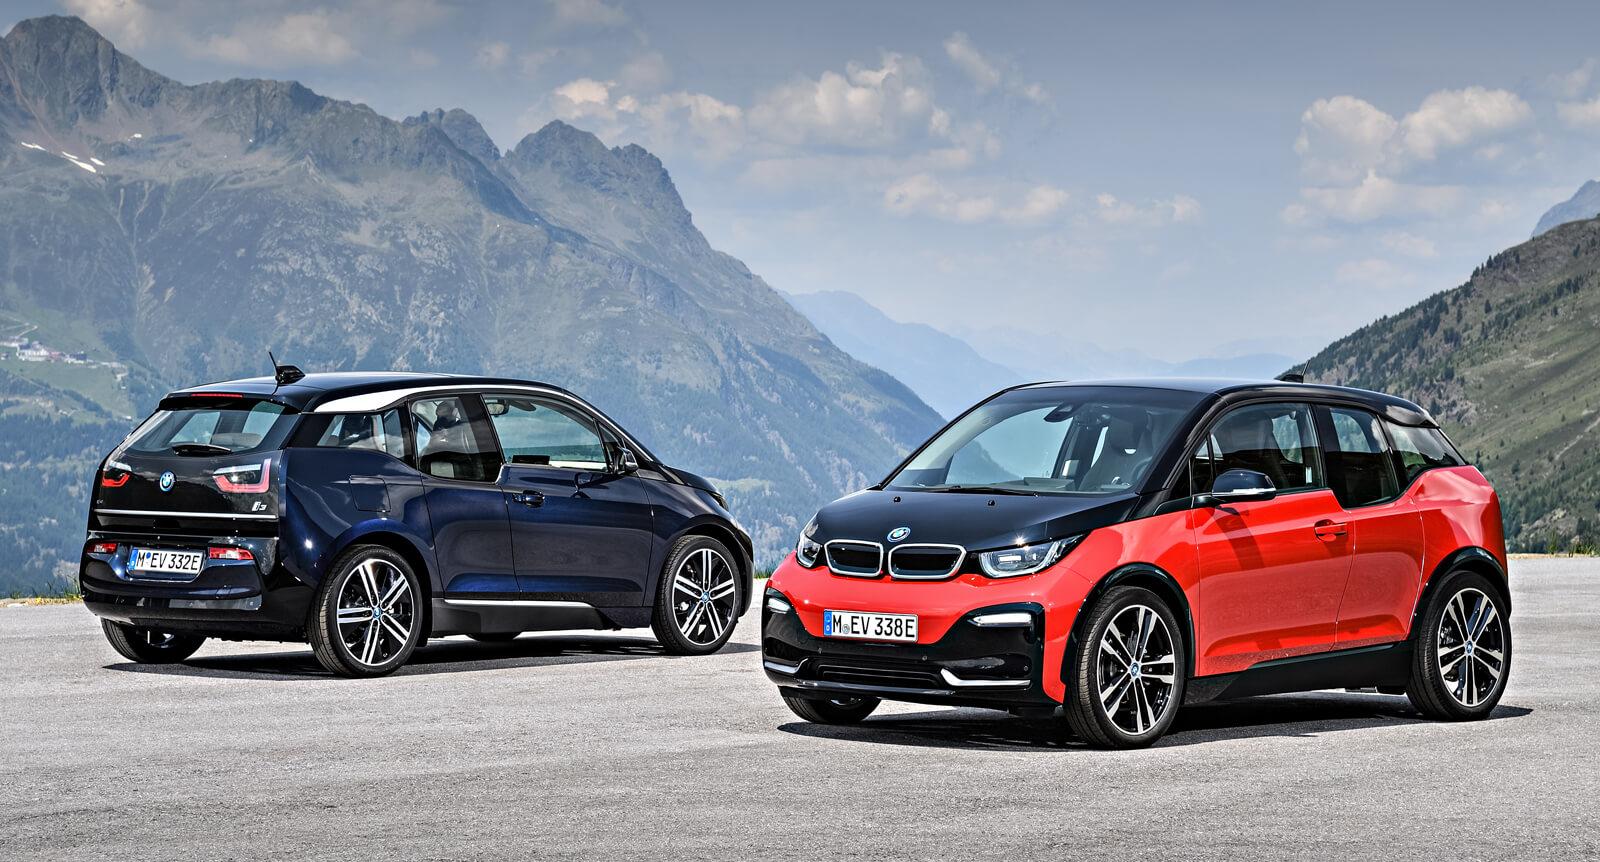 BMW i3 Price